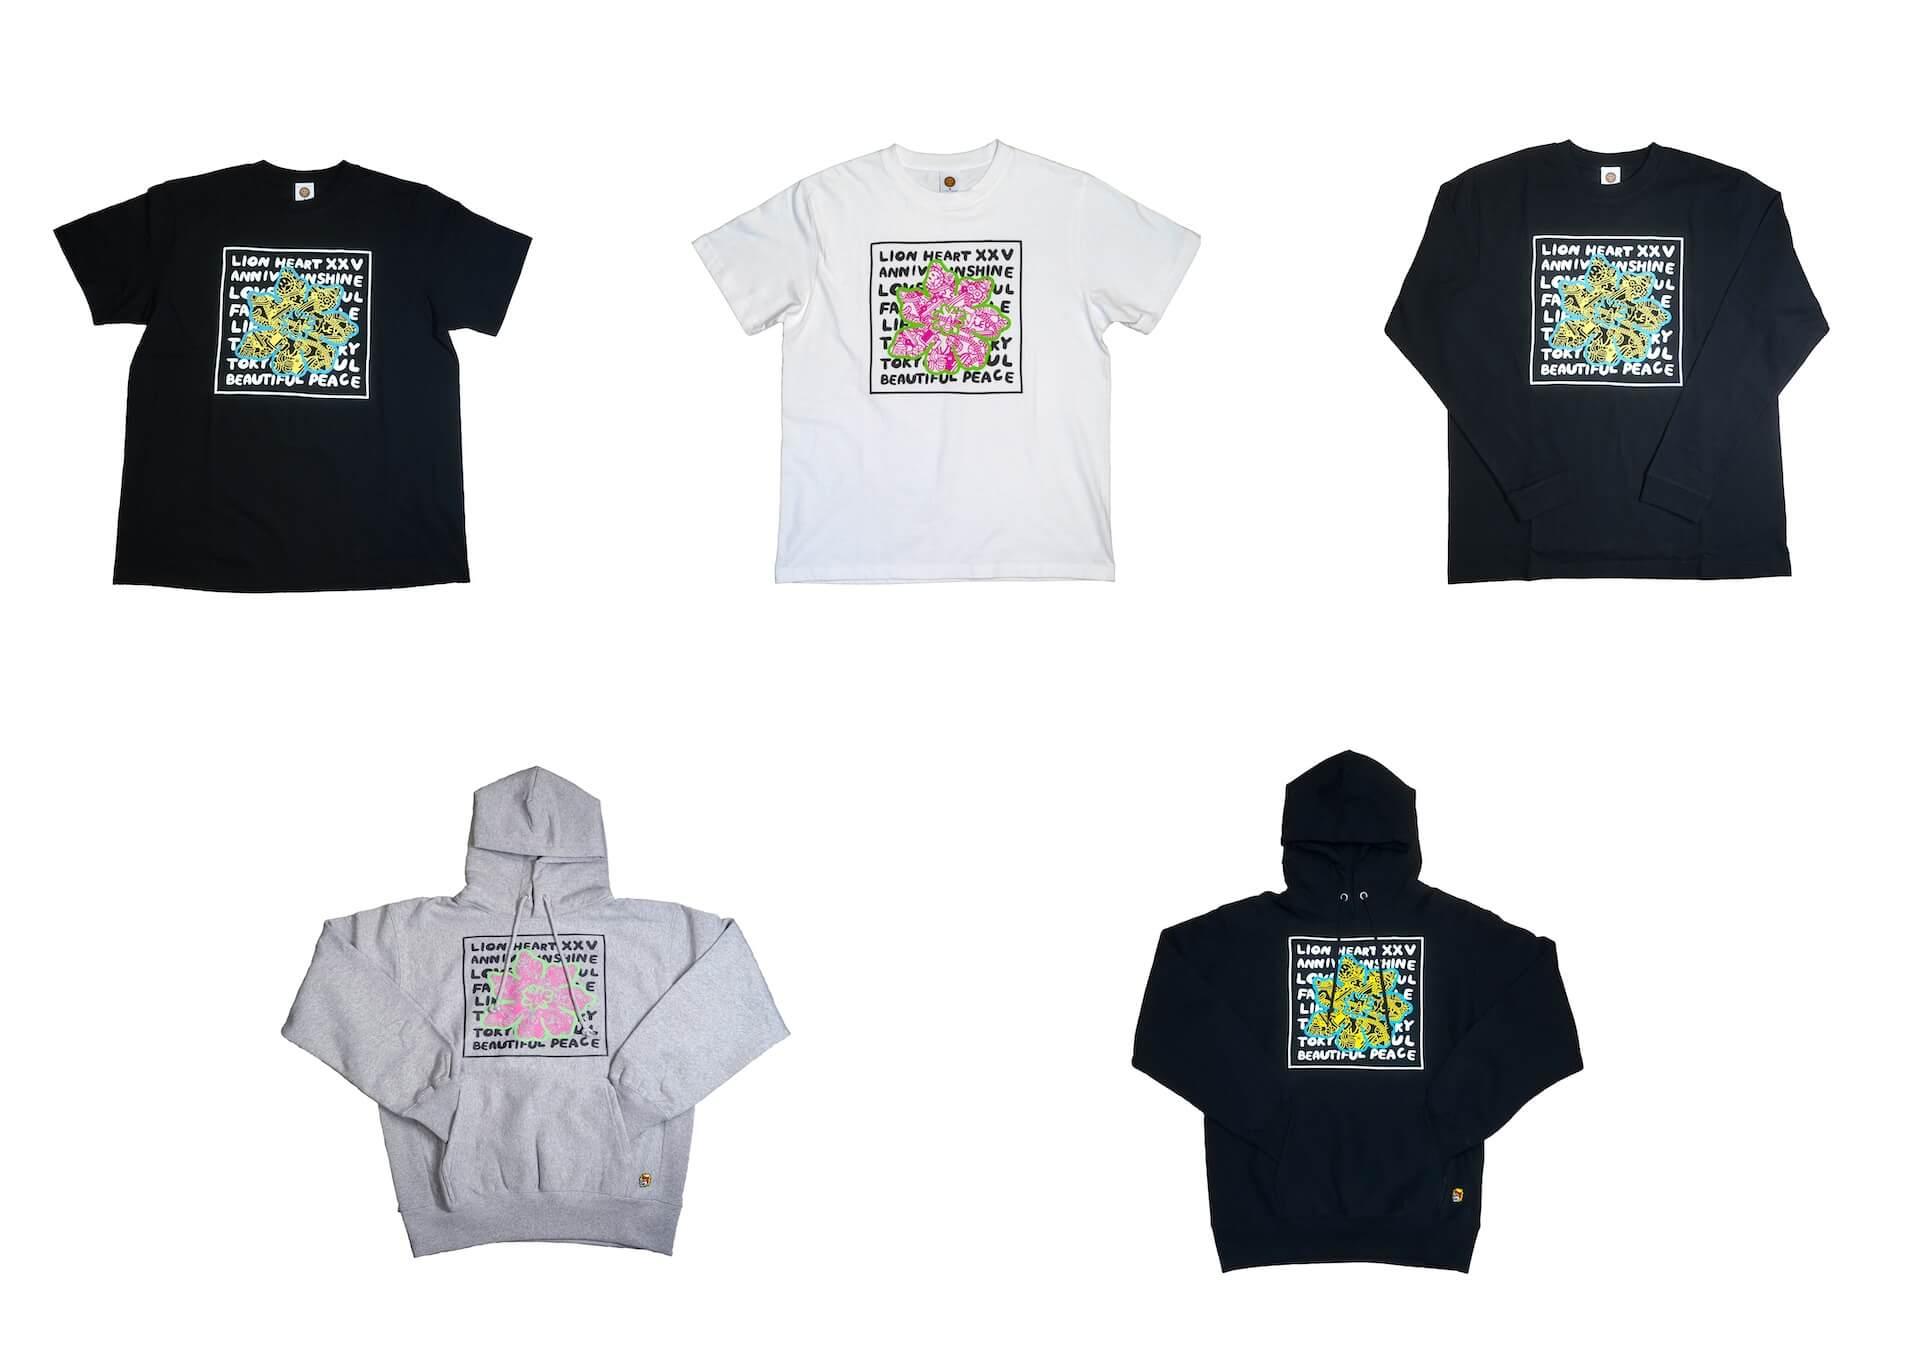 LION HEARTが設立25周年を記念したSHETAとのコラボ新作をリリース!ブランド初となるアパレルラインも fashion211013_tokyoheart-01